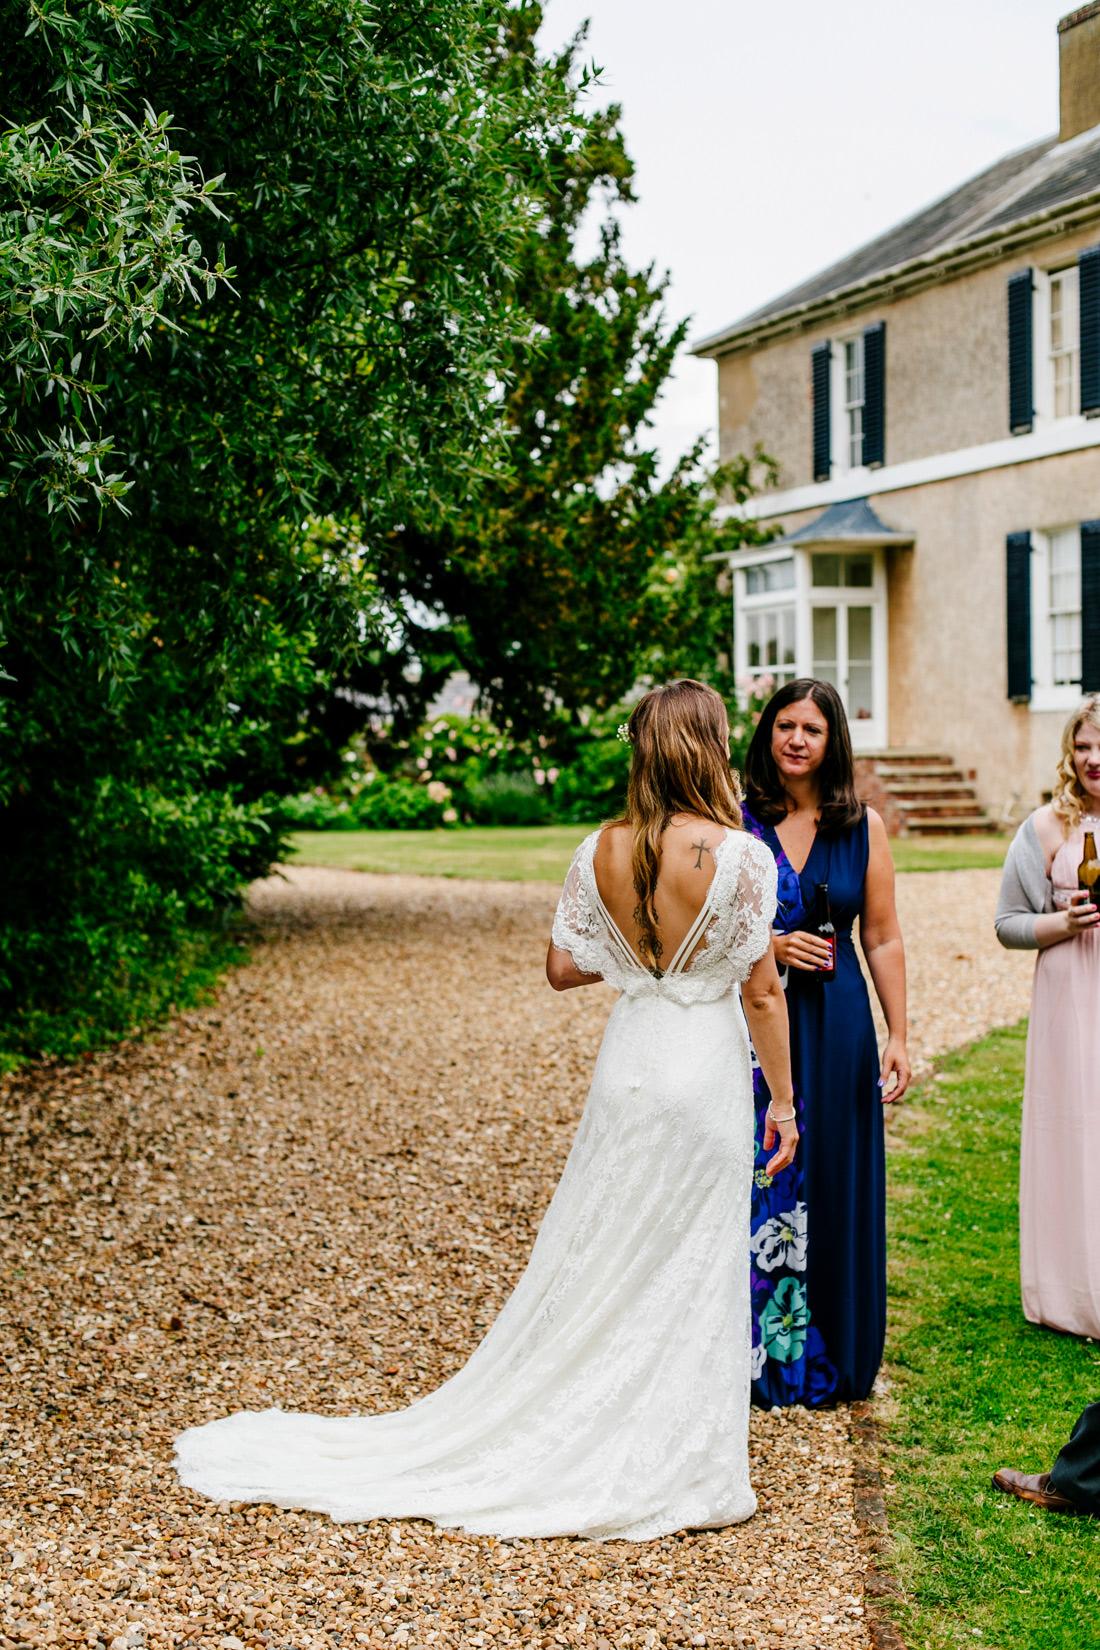 Preston-Court-kent-wedding-photographer-Epic-Love-Story-059